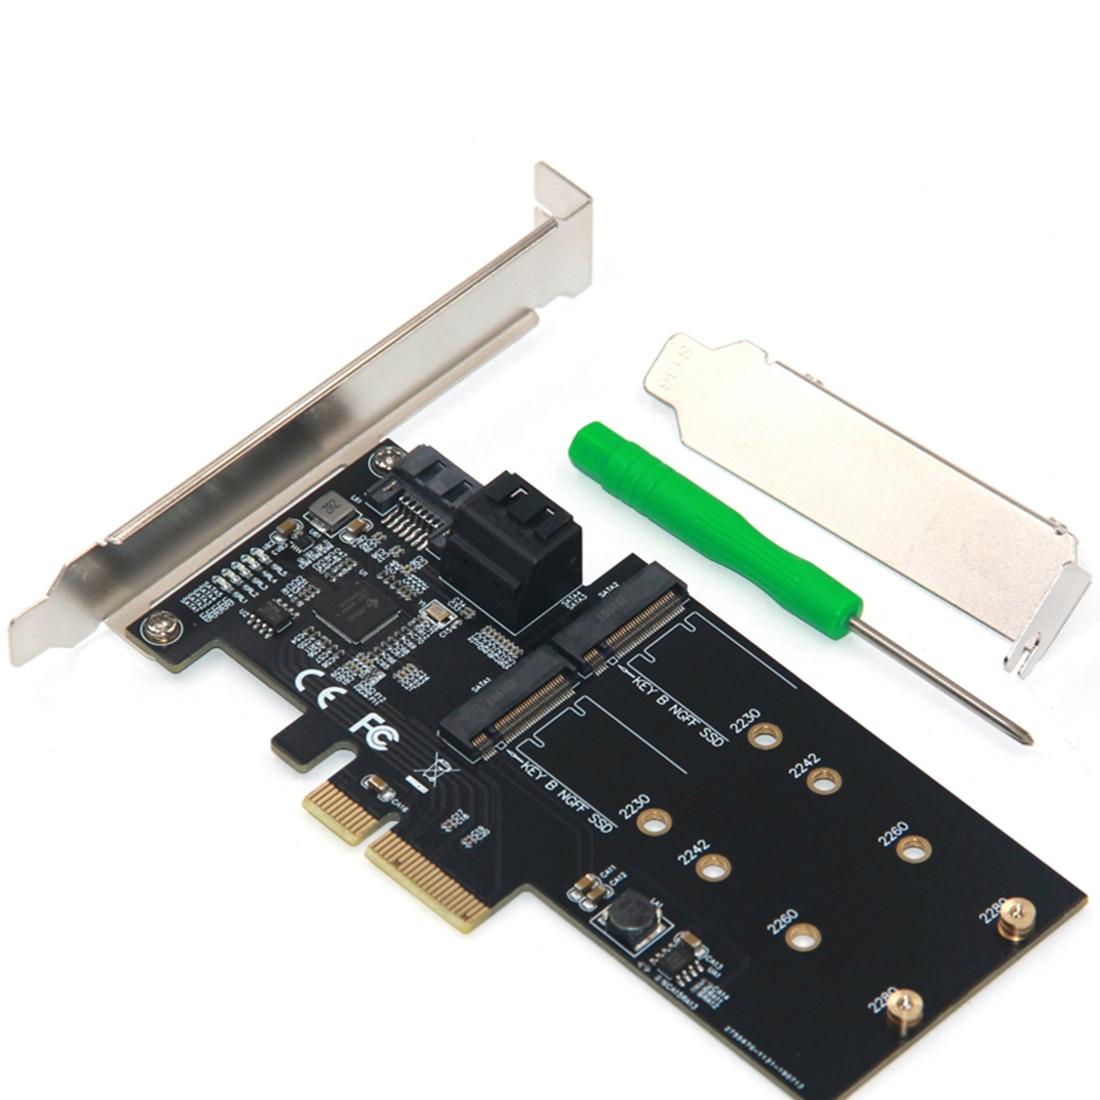 SATA Raid Controller SATA Raid M.2 PCI Express Raid Card 3Port SATA3.0 6Gbps + 2Port M.2 NGFF SSD B Key Support RAID0 RAID1 AHCI